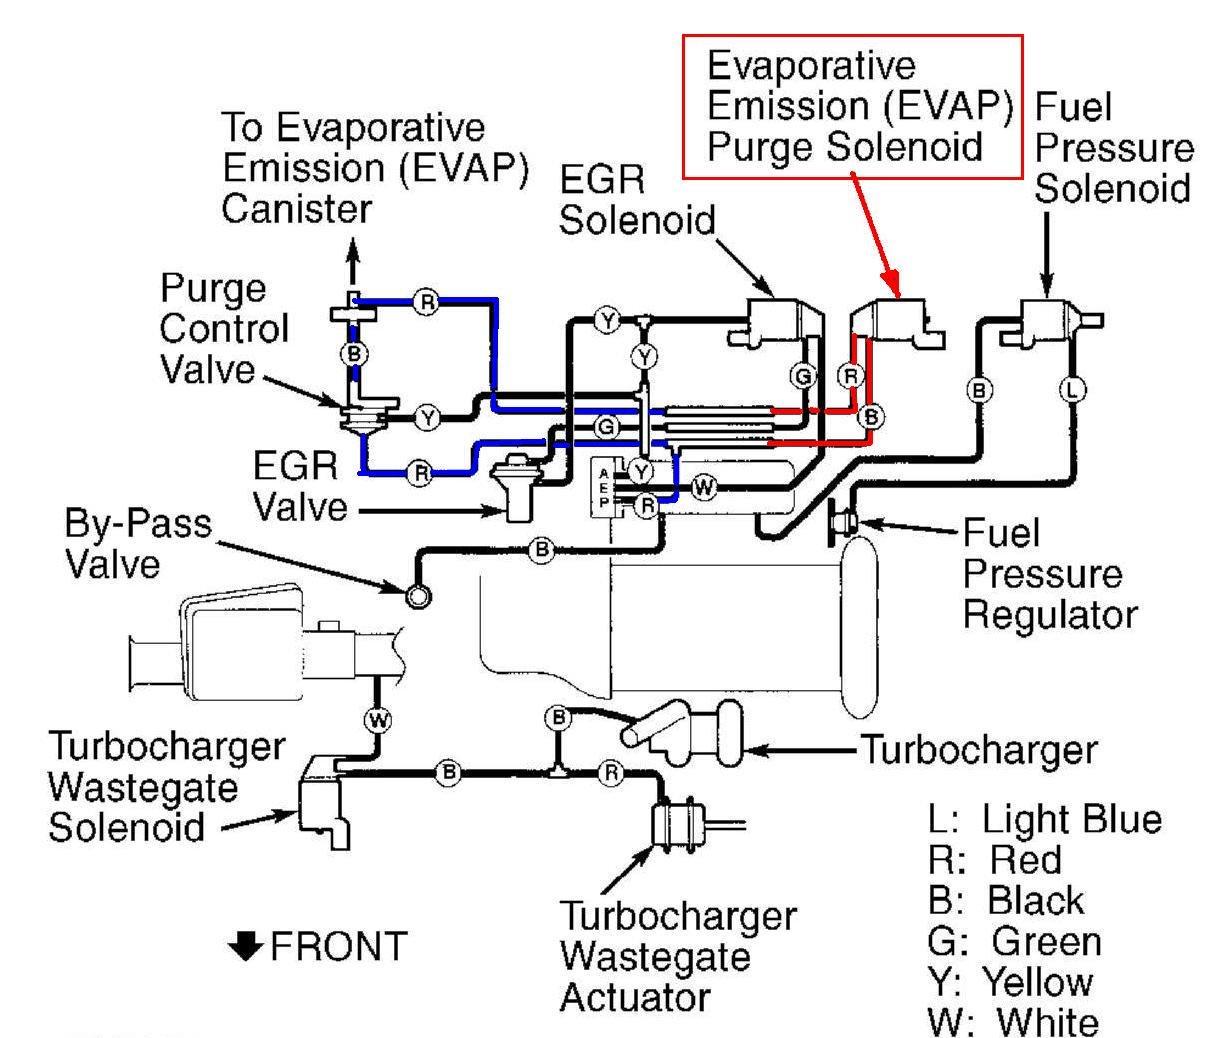 Golkar New Emission Vacuum Vlave Parts For Mitsubishi: 1997 Eclipse, Code Is P1494......Mfg Control Aux. Emission